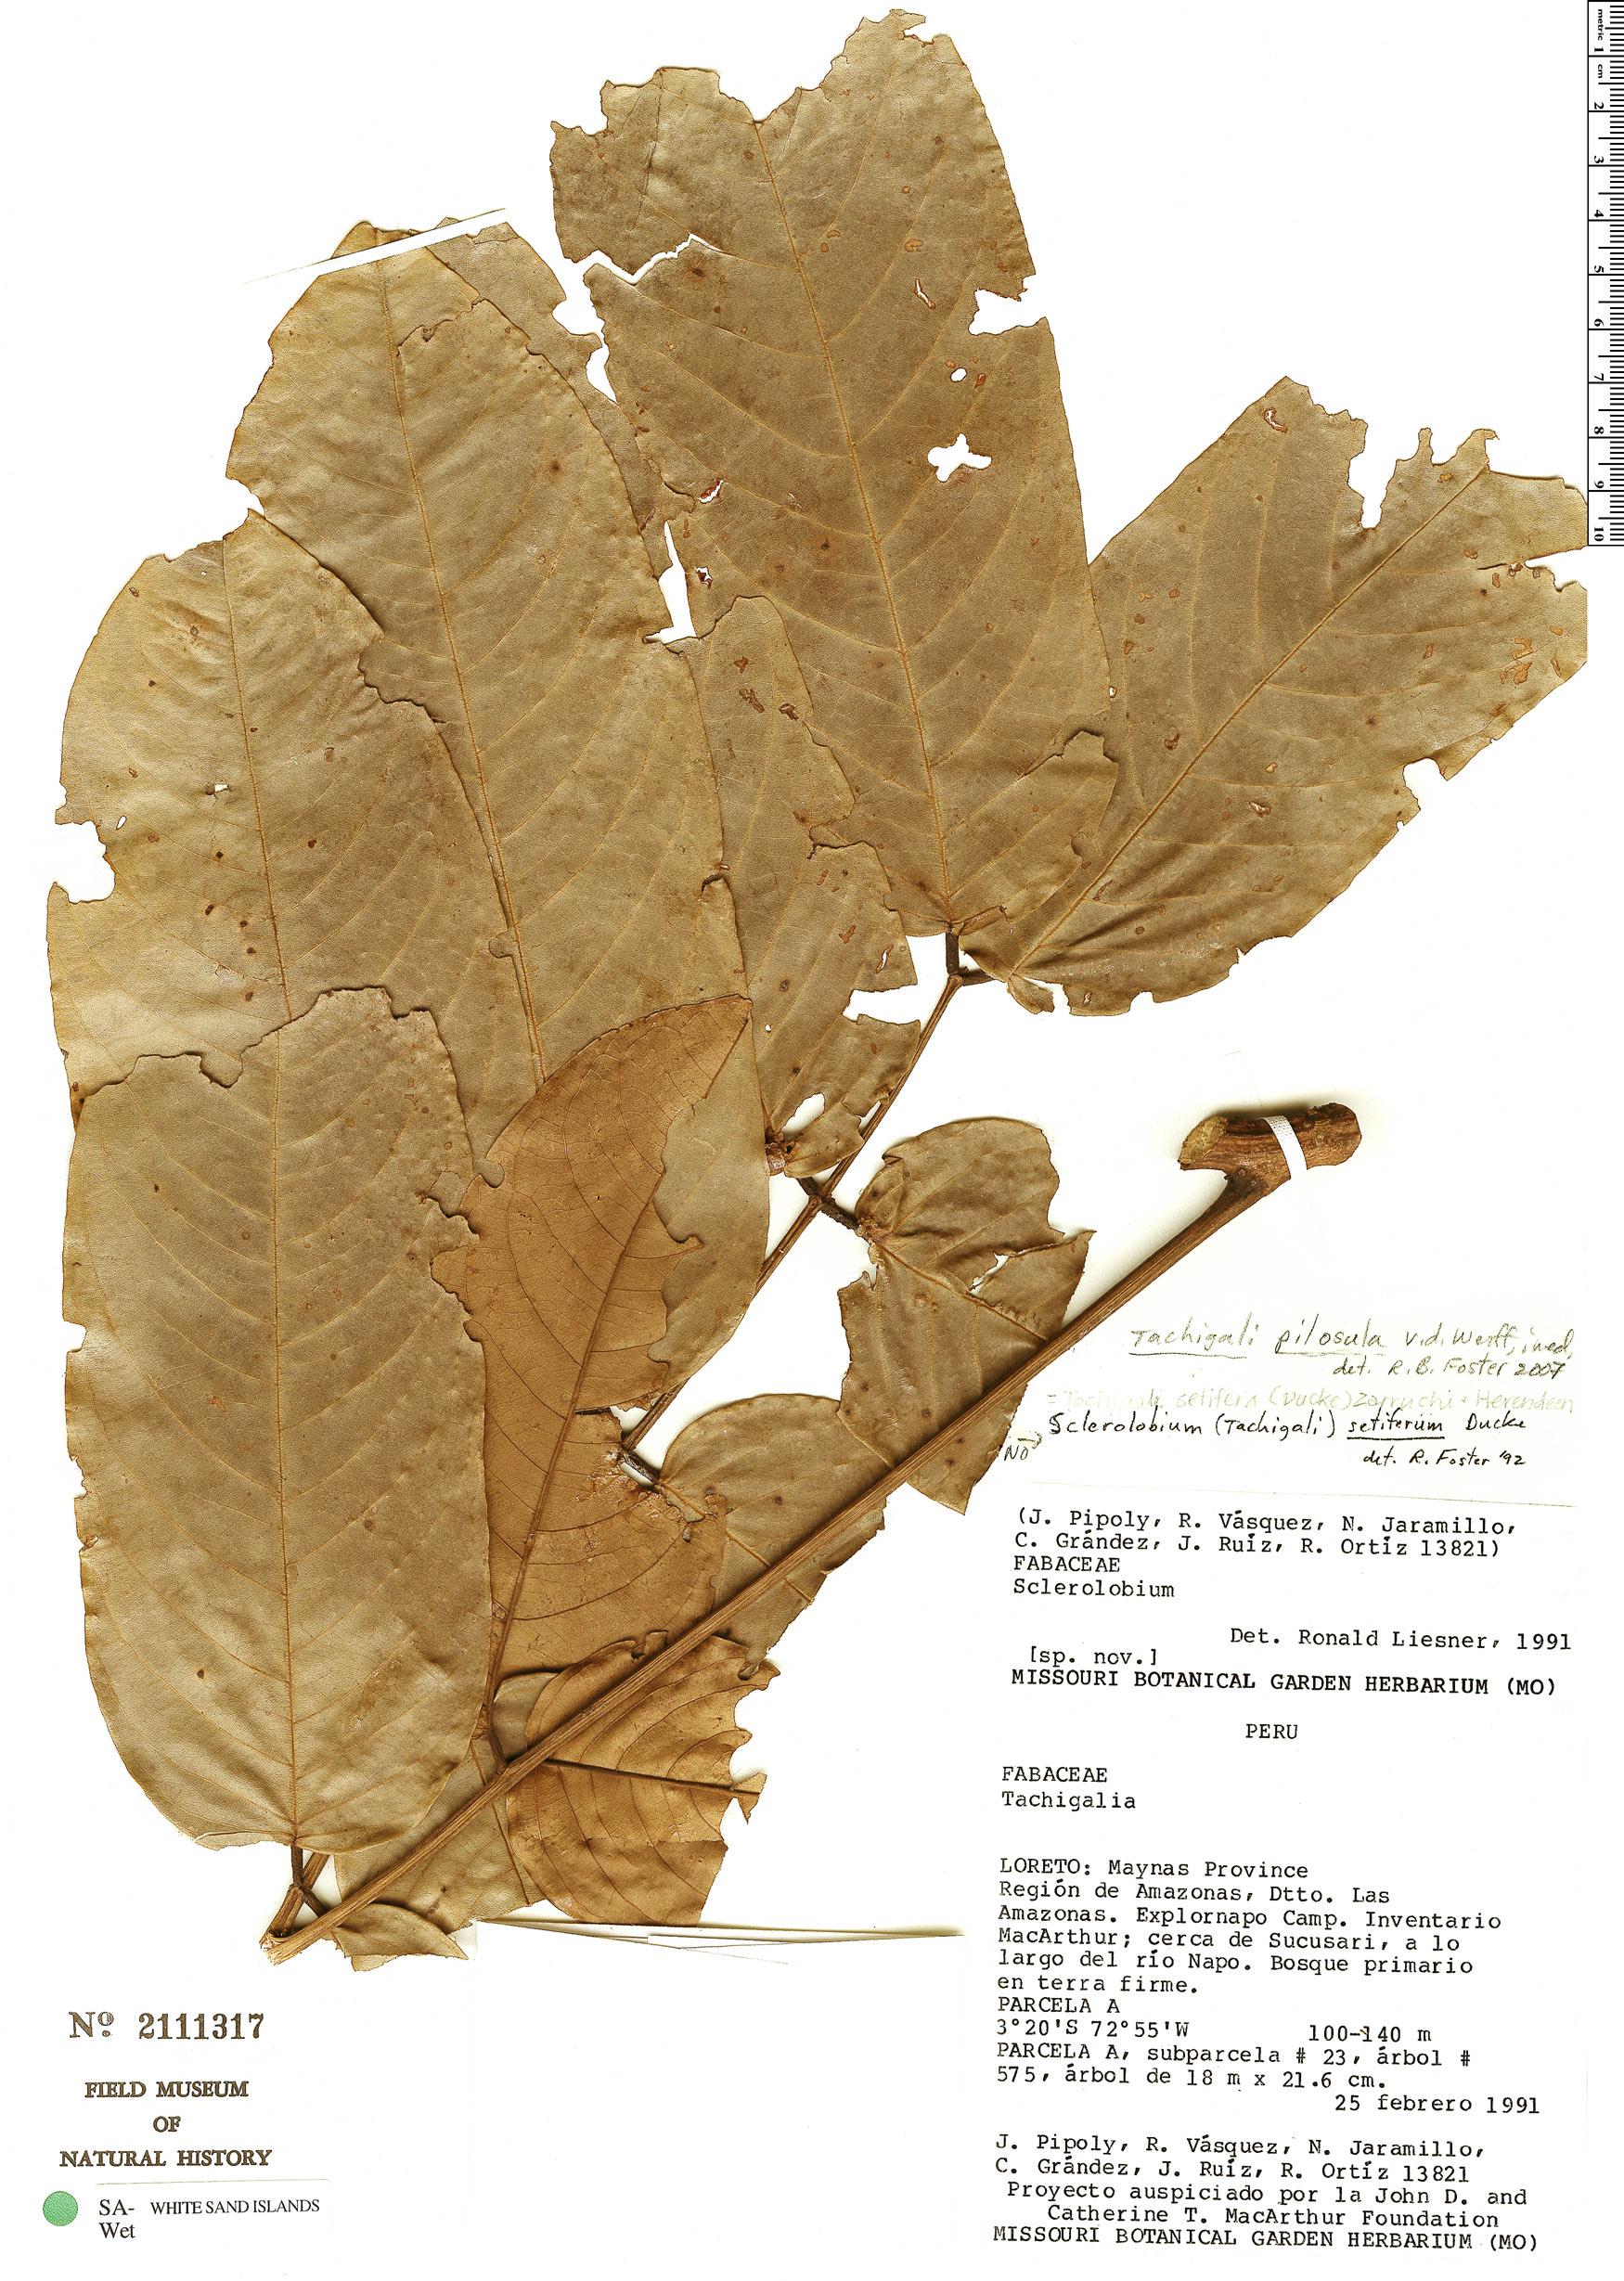 Specimen: Tachigali pilosula